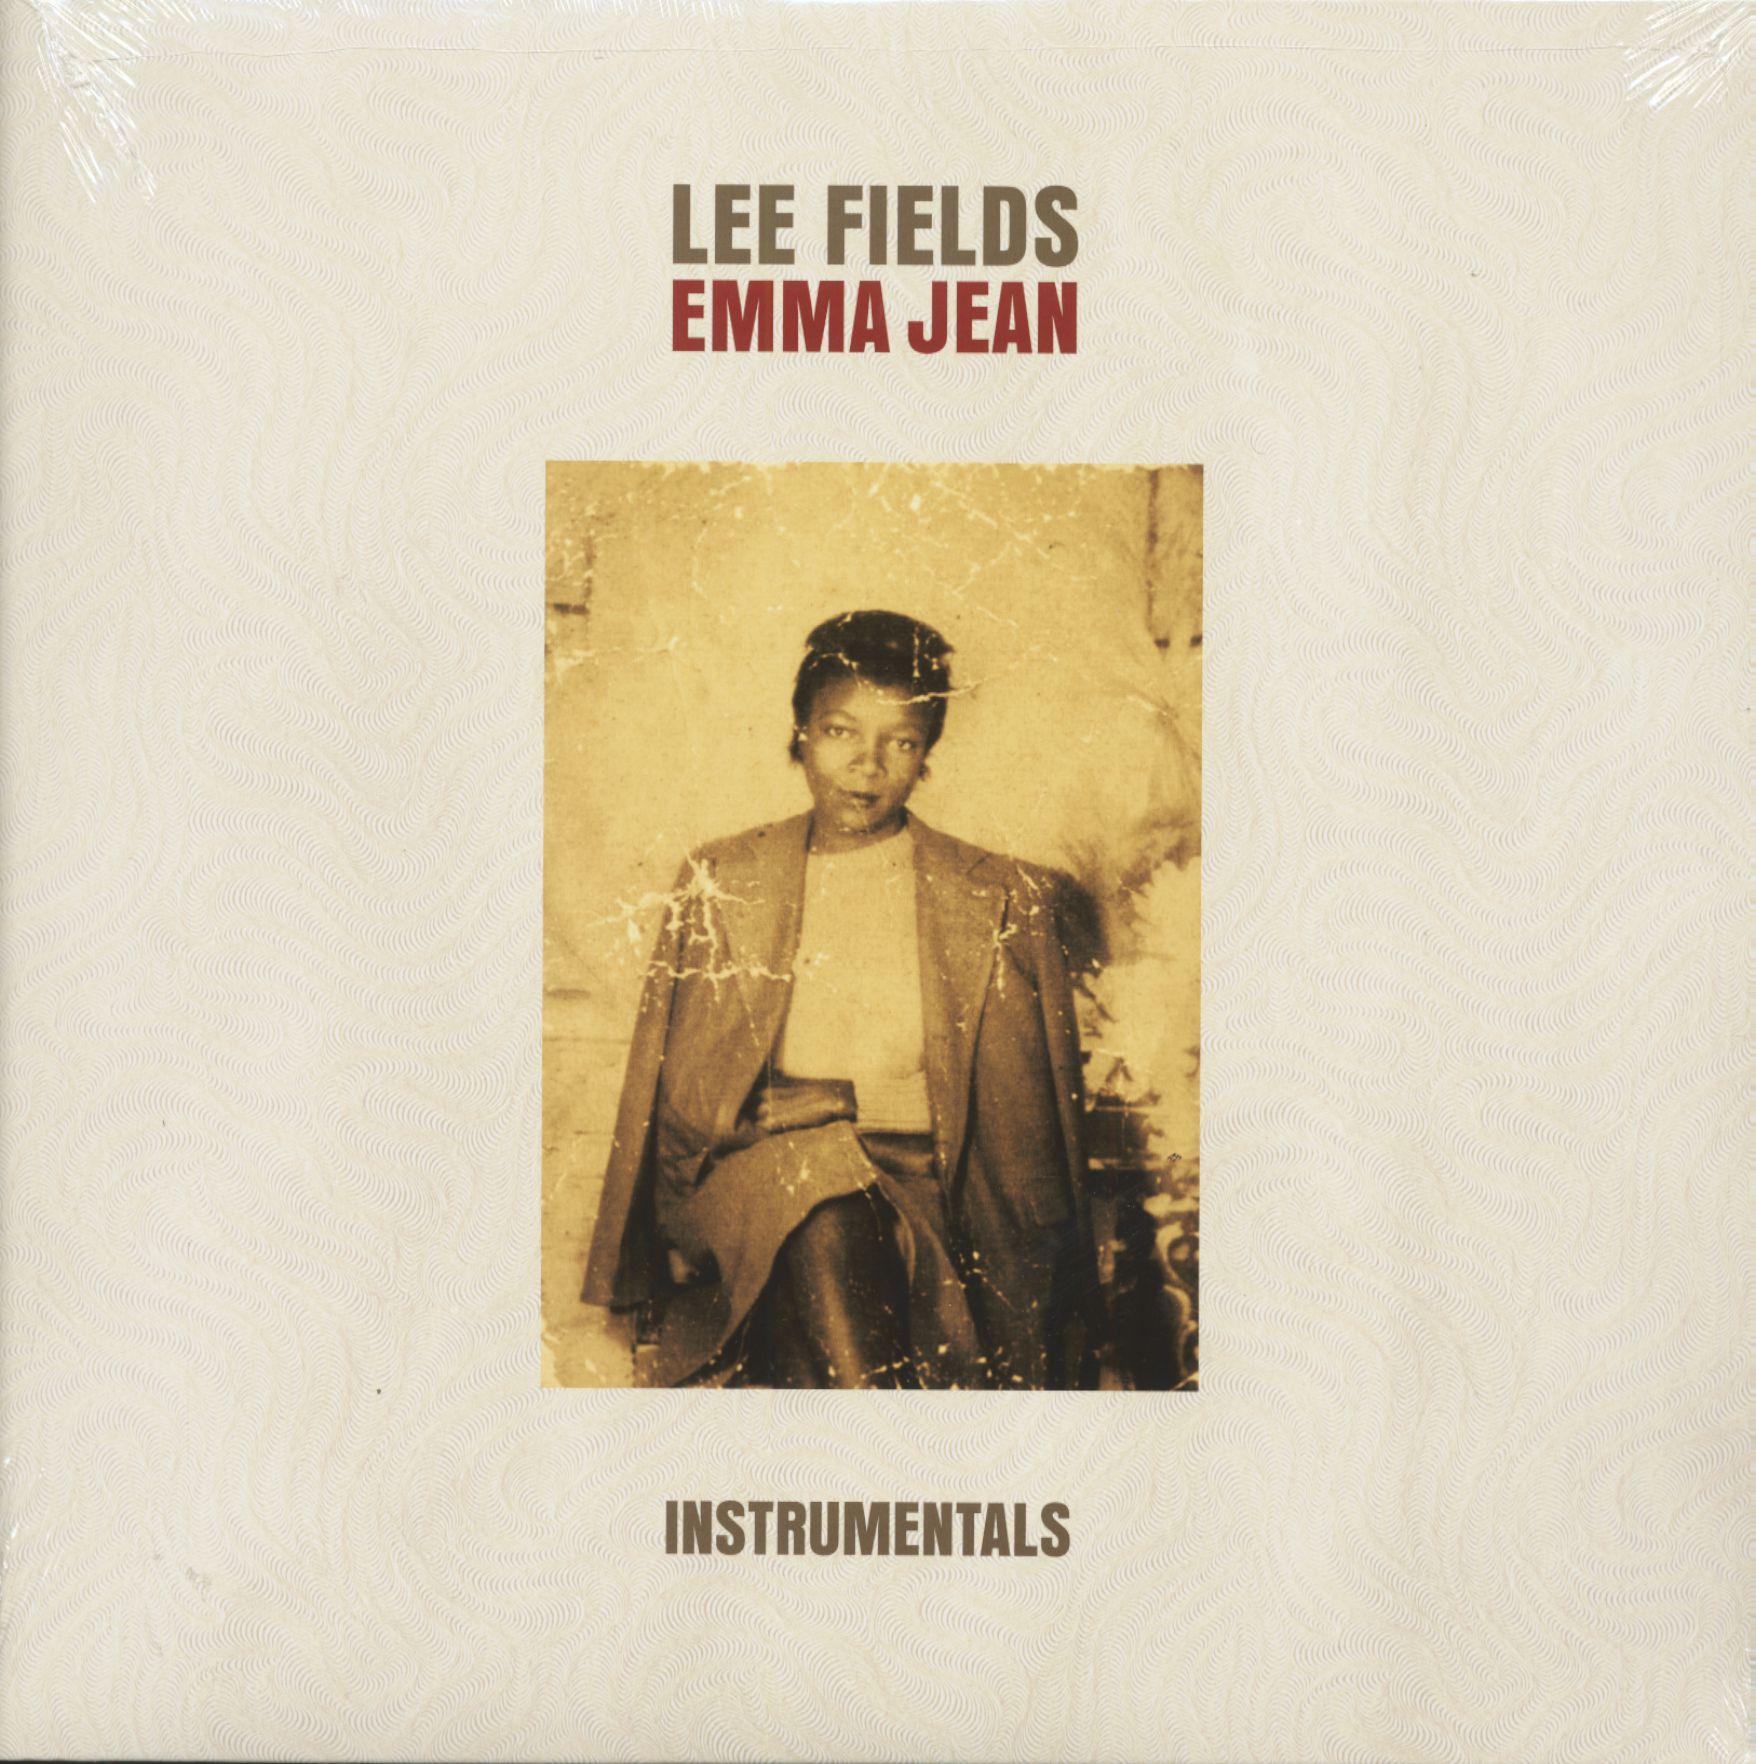 Lee Fields Lp Emma Jean Instrumentals Lp Bear